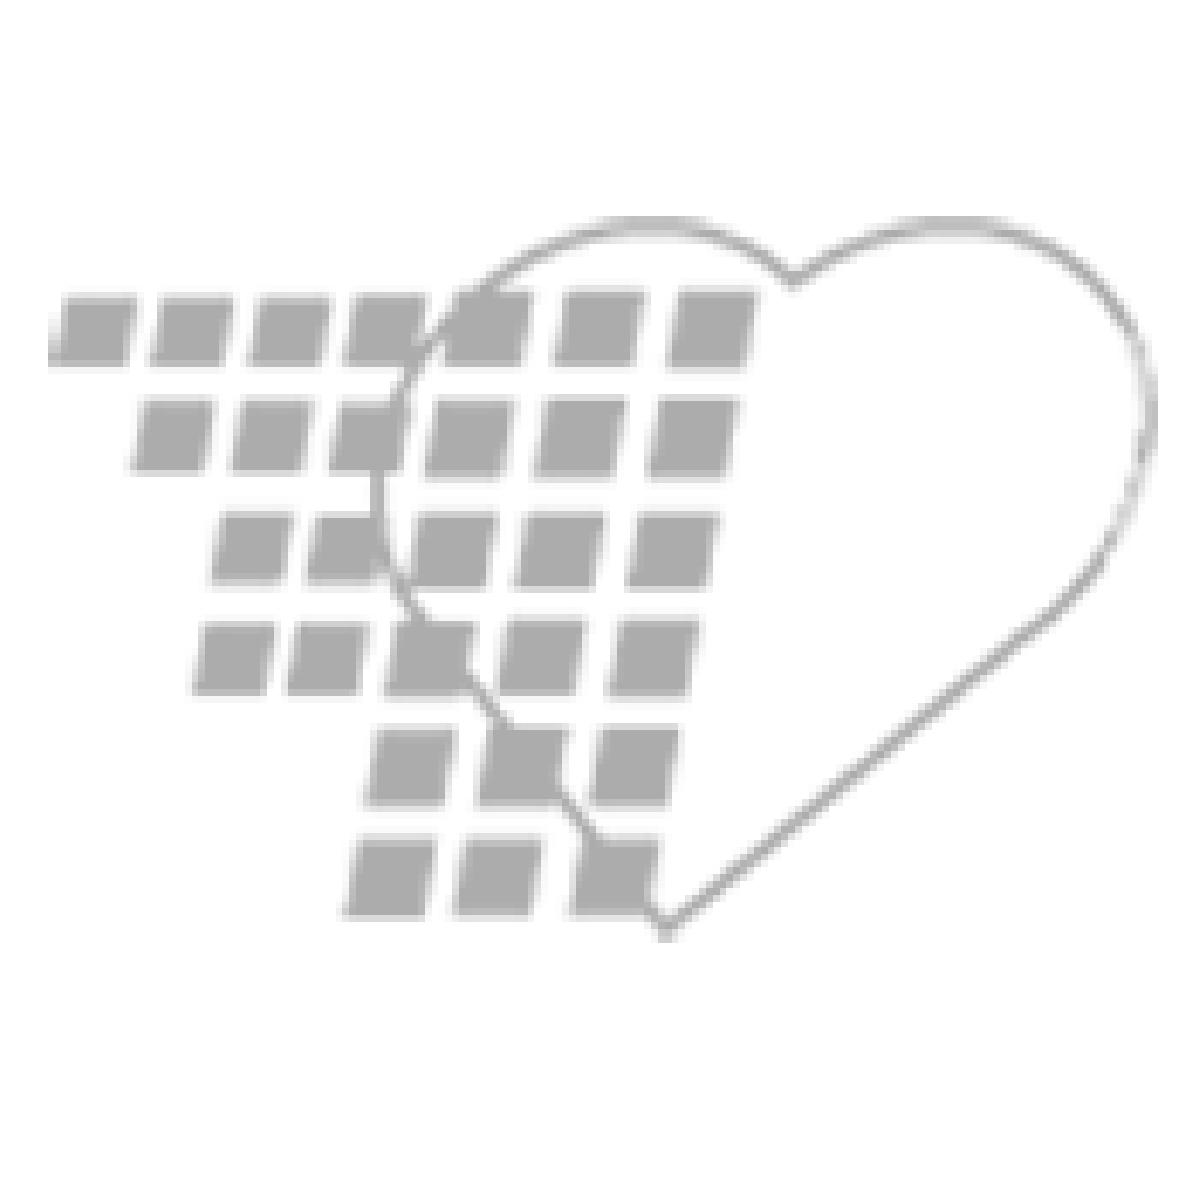 06-93-9003 - Demo Dose® Zithromx (Azithromycn) 10 mL 500mg/vial